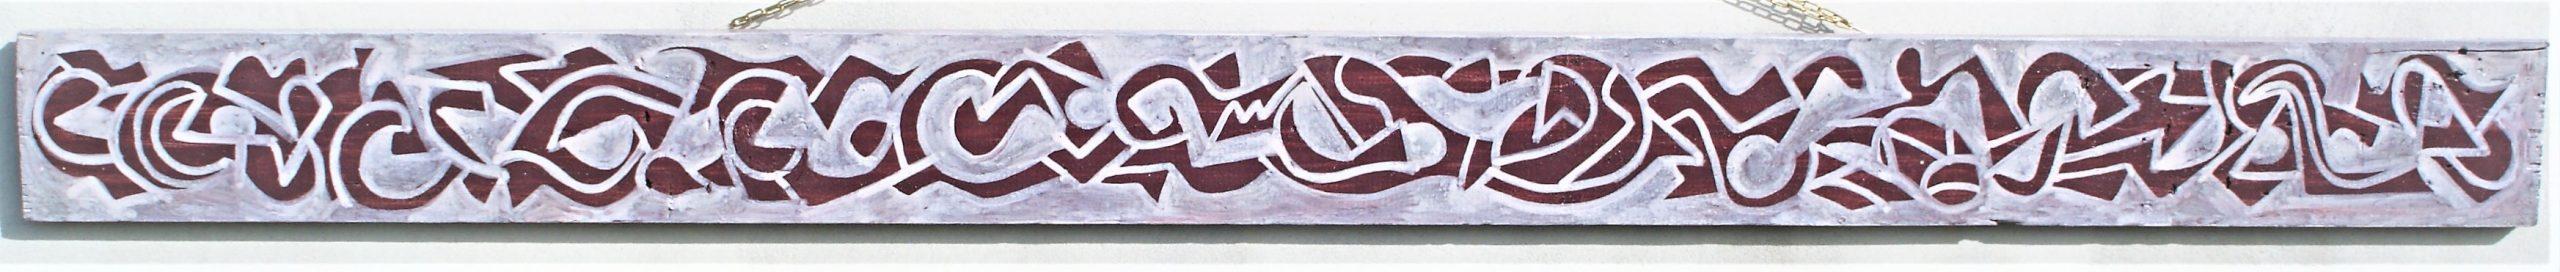 abstract art sicily